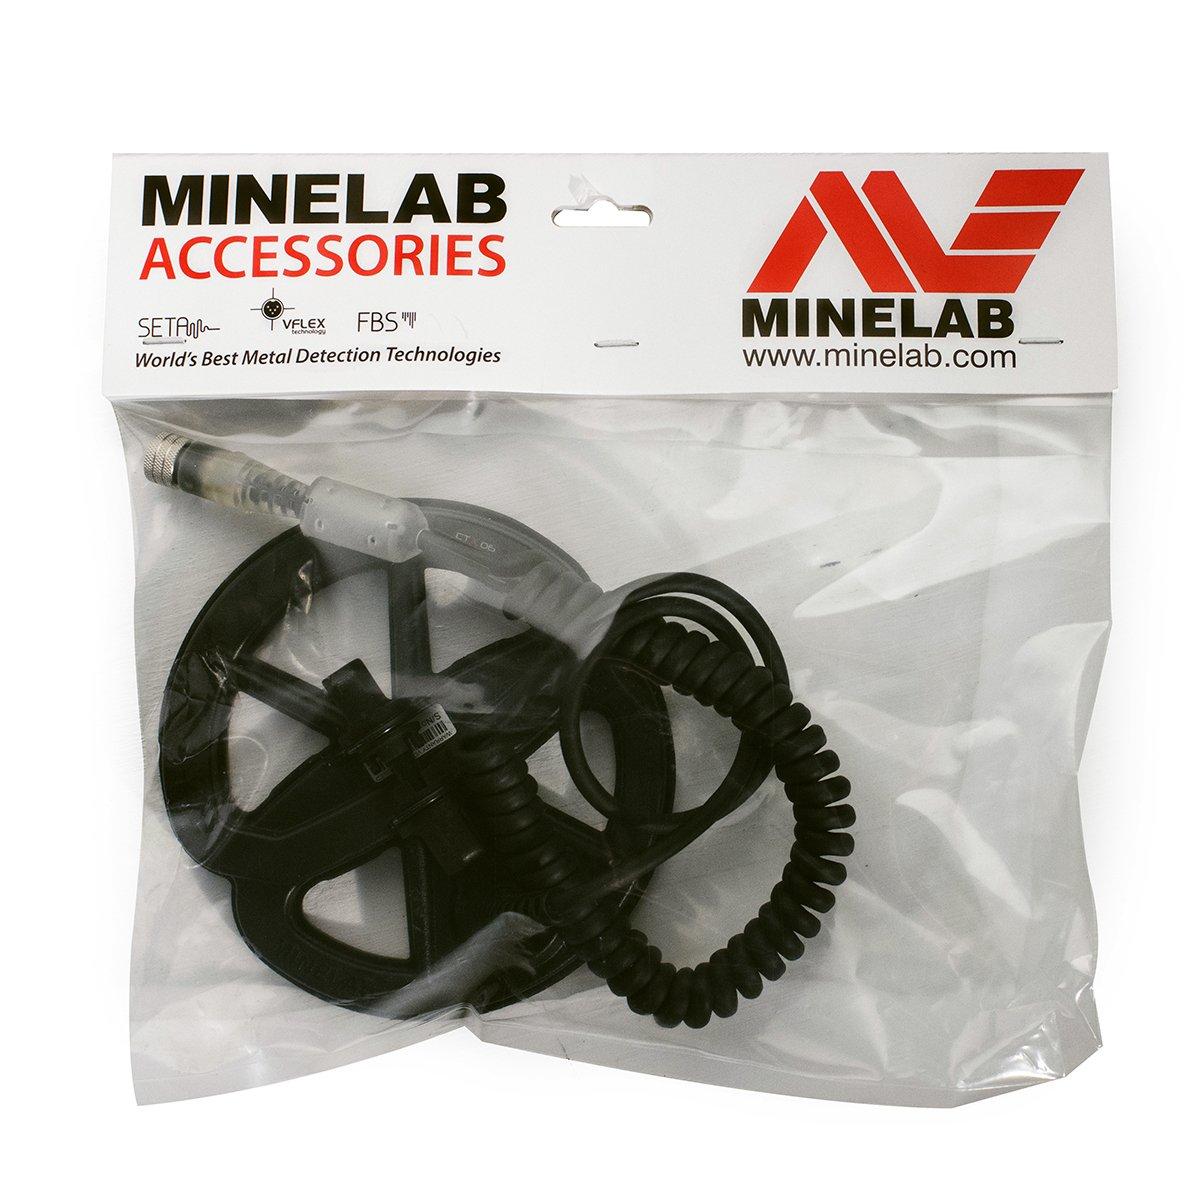 6-Inch Minelab CTX 3030 Double-D Coil Garden Accessory